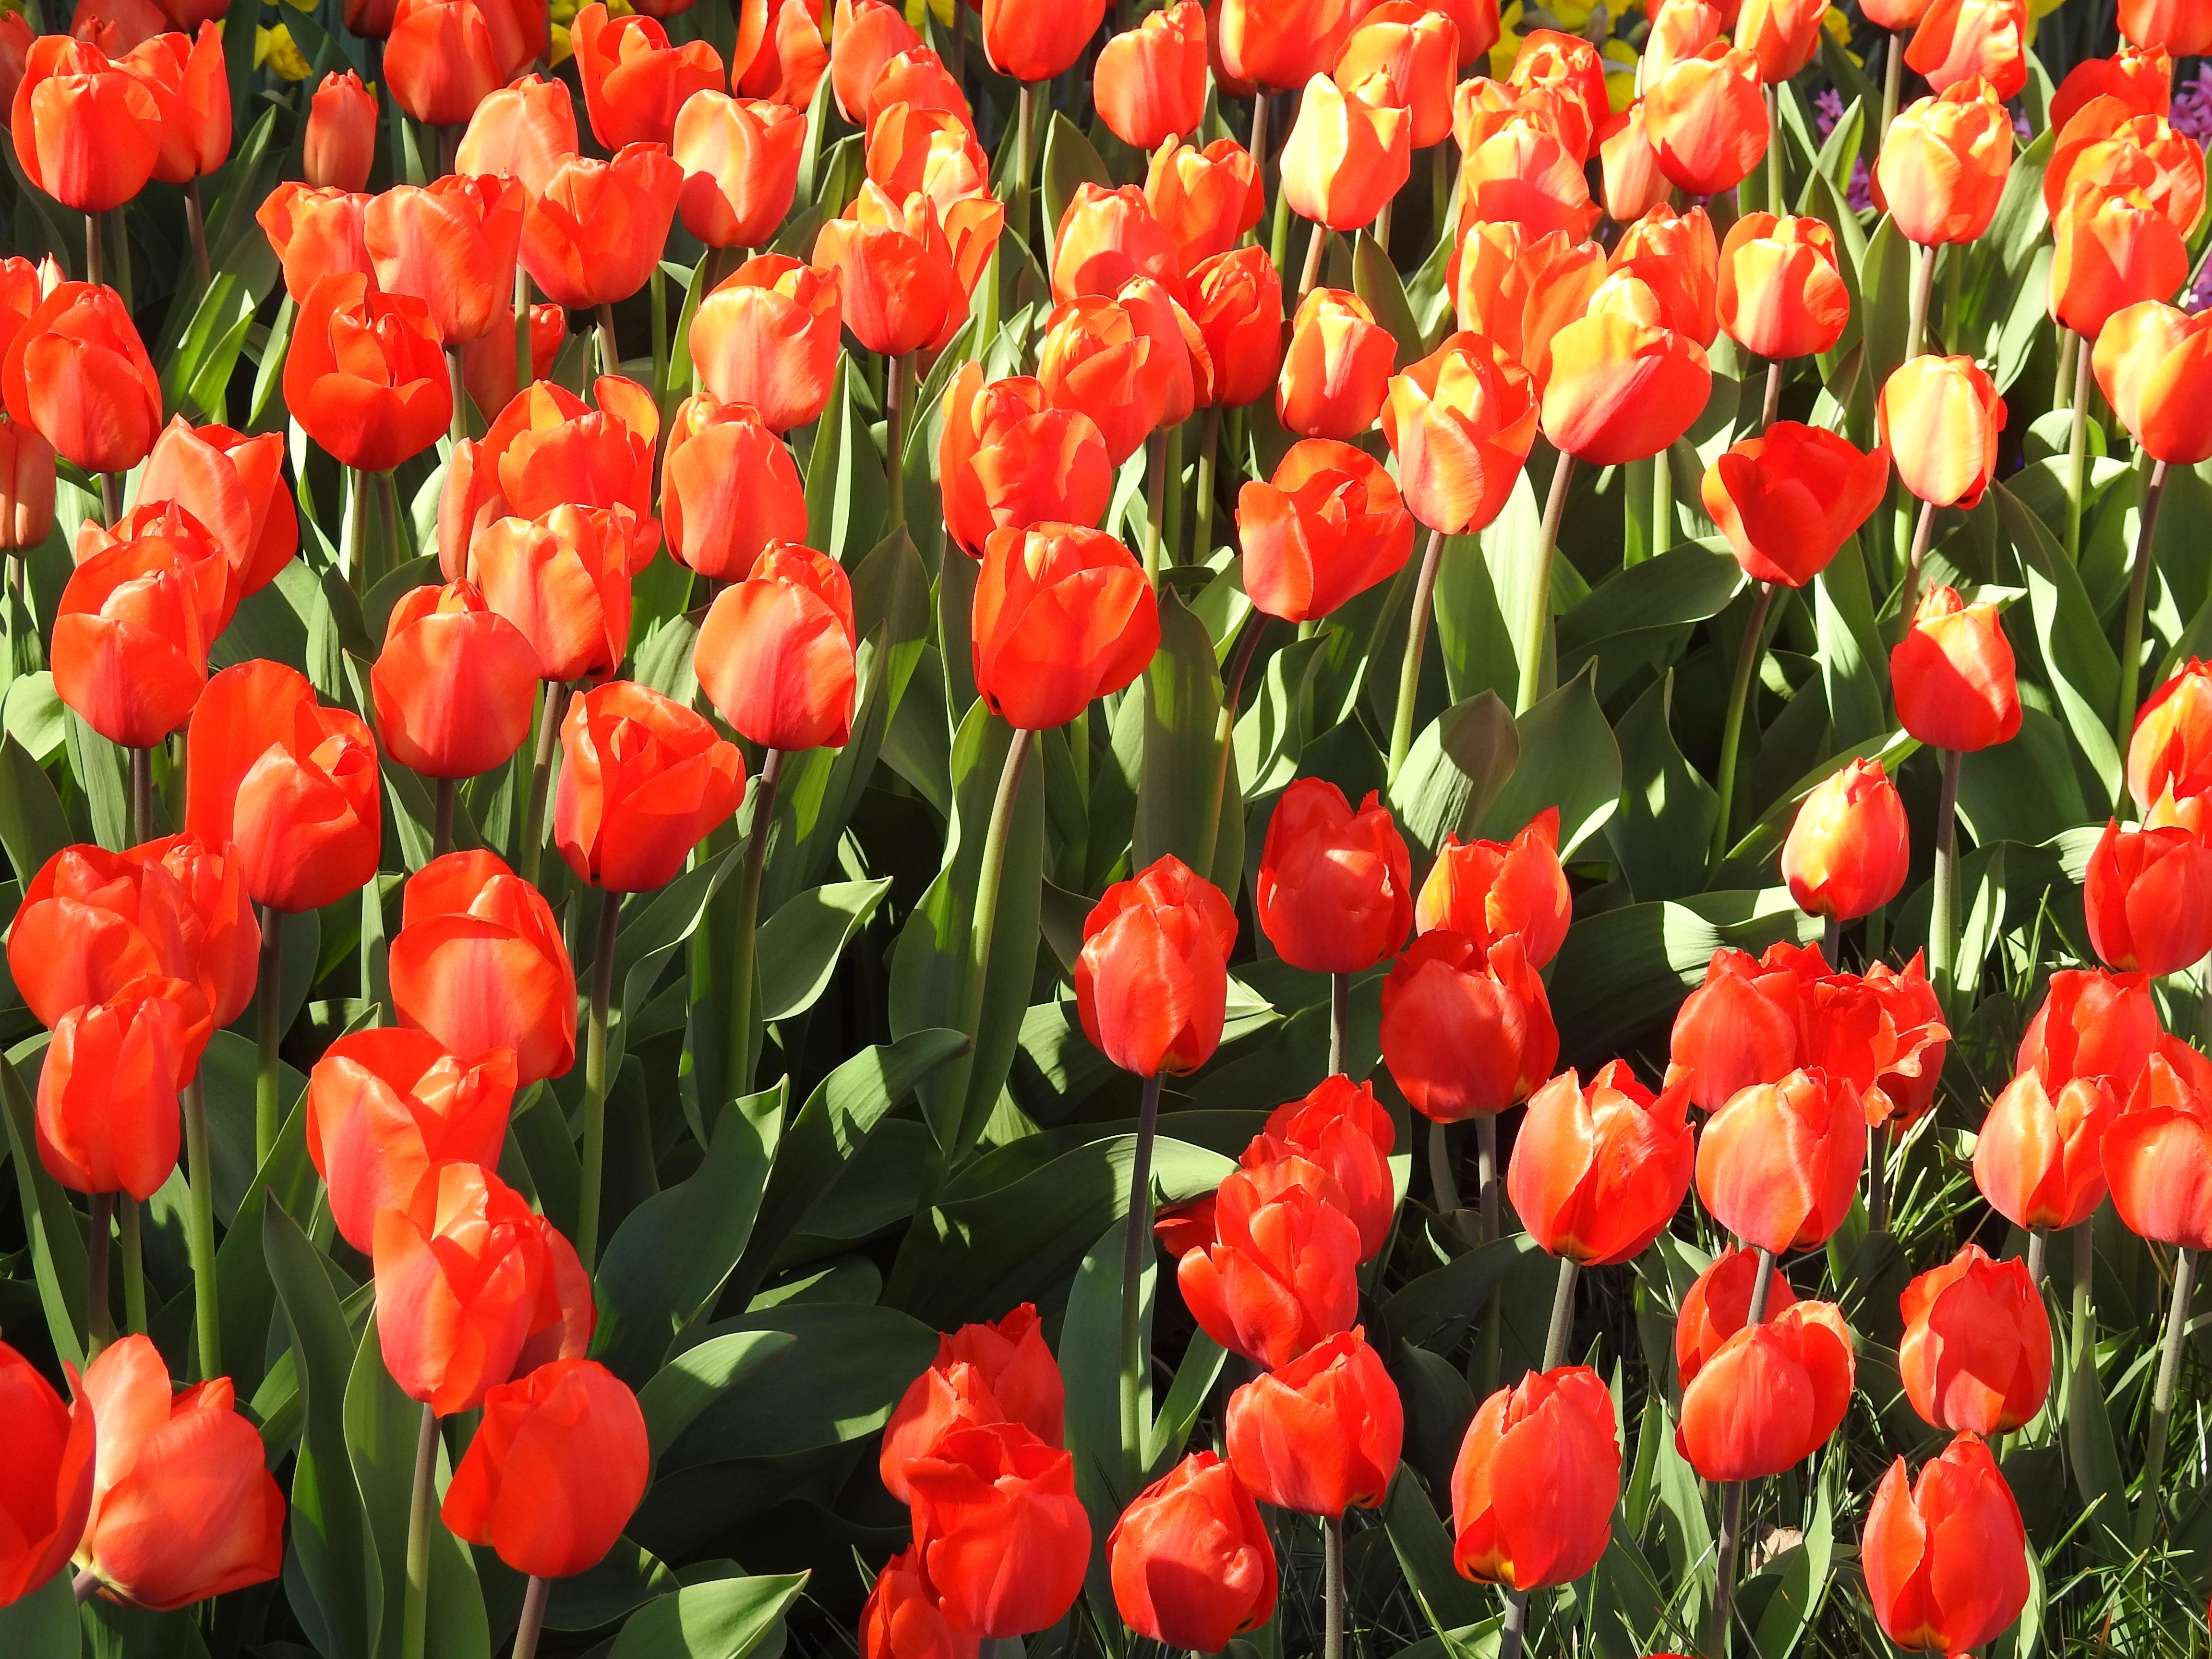 Free Images : nature, blossom, flower, petal, bloom, floral, tulip ...